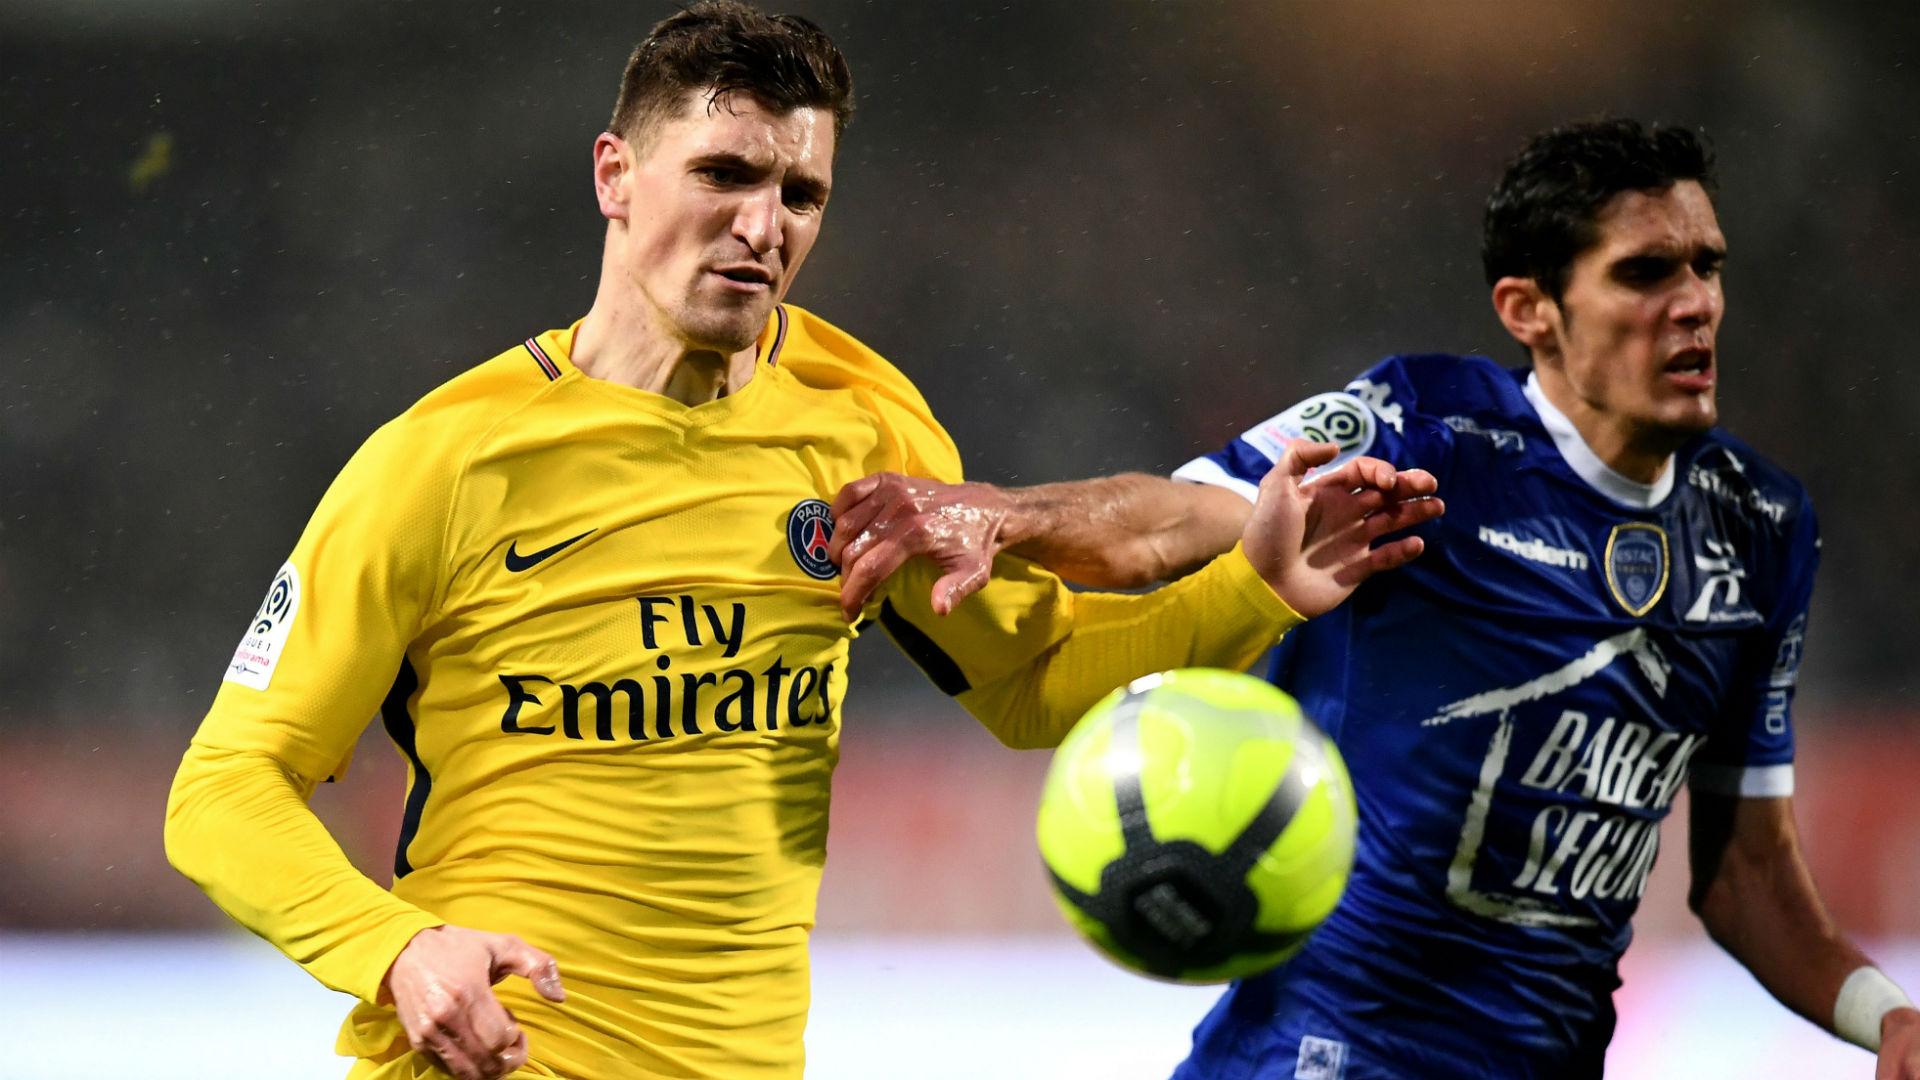 PSG : Meunier regrette que Ben Arfa n'ait pas eu sa chance